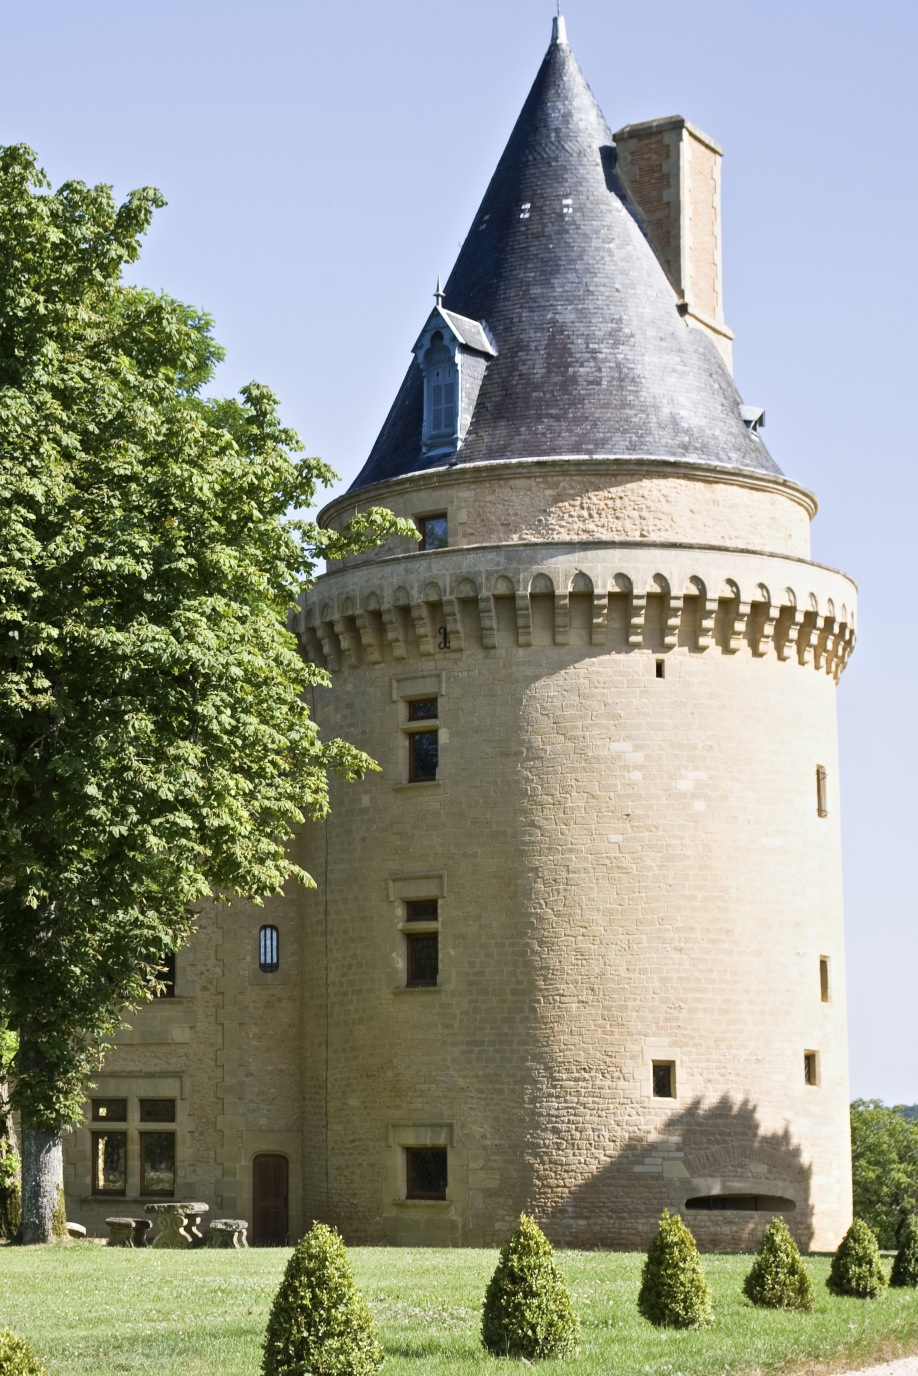 72_24478_7_chateau_de_campagnac.jpg